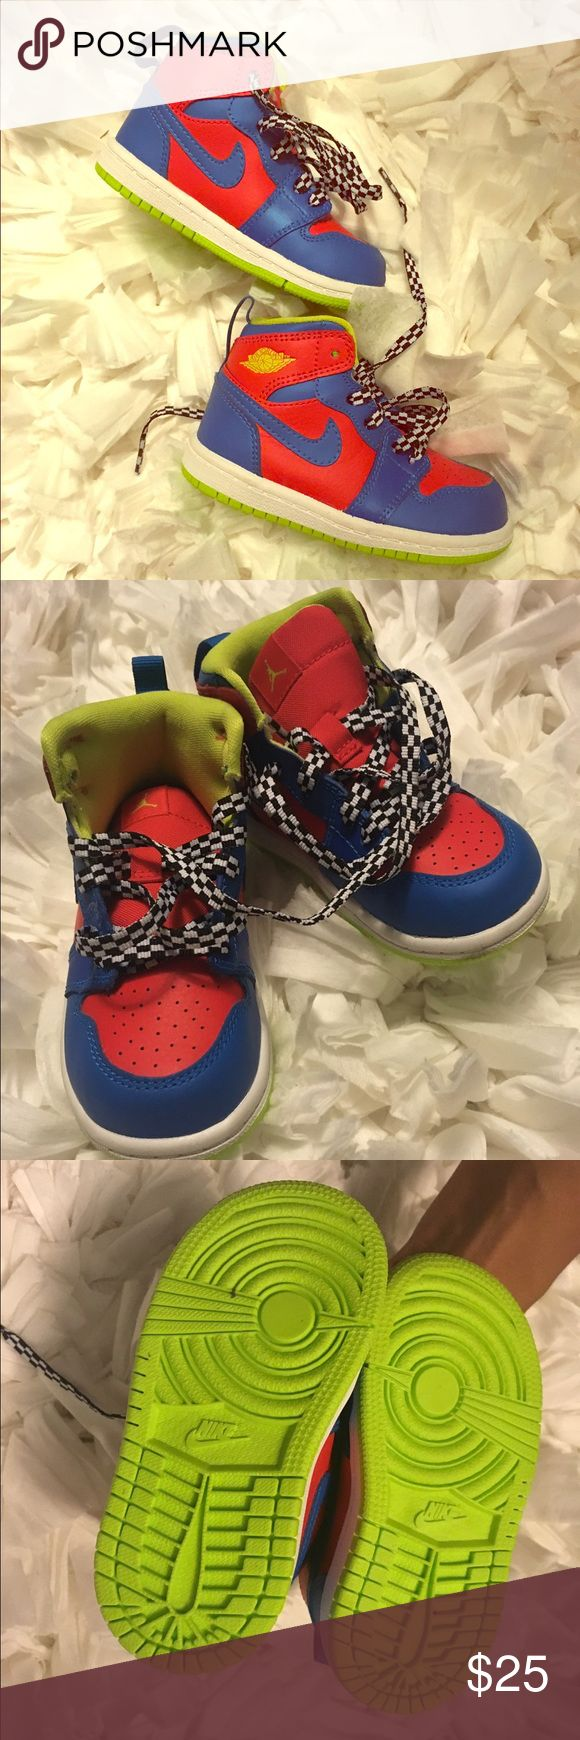 "Nike Jordan Retro 1 ""Nitro"" Preloved💕 Jordan 1 ""Nitro"" Toddler Sneakers//Worn ☝🏽(1) time//No scuffs//No stains//No box Nike Shoes Sneakers"